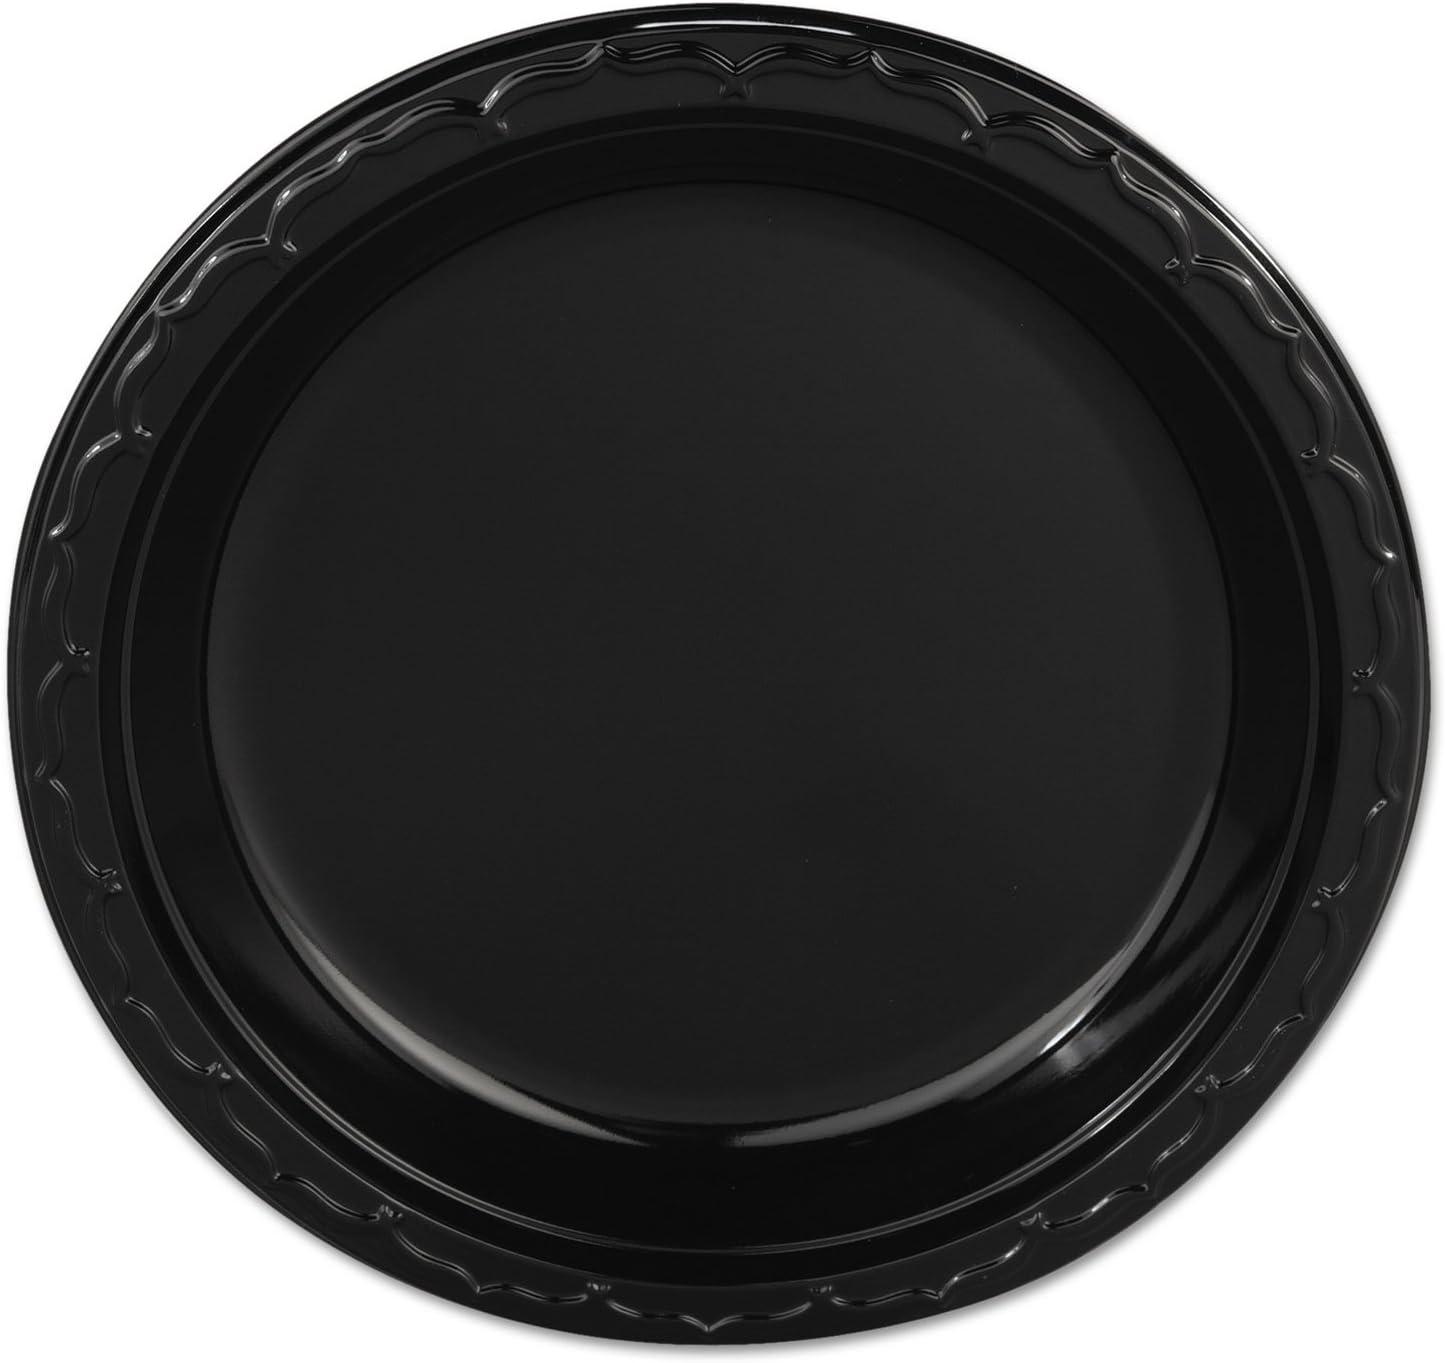 Genpak trend rank trust BLK09 Silhouette Plastic Plates 400 Carton Black 9